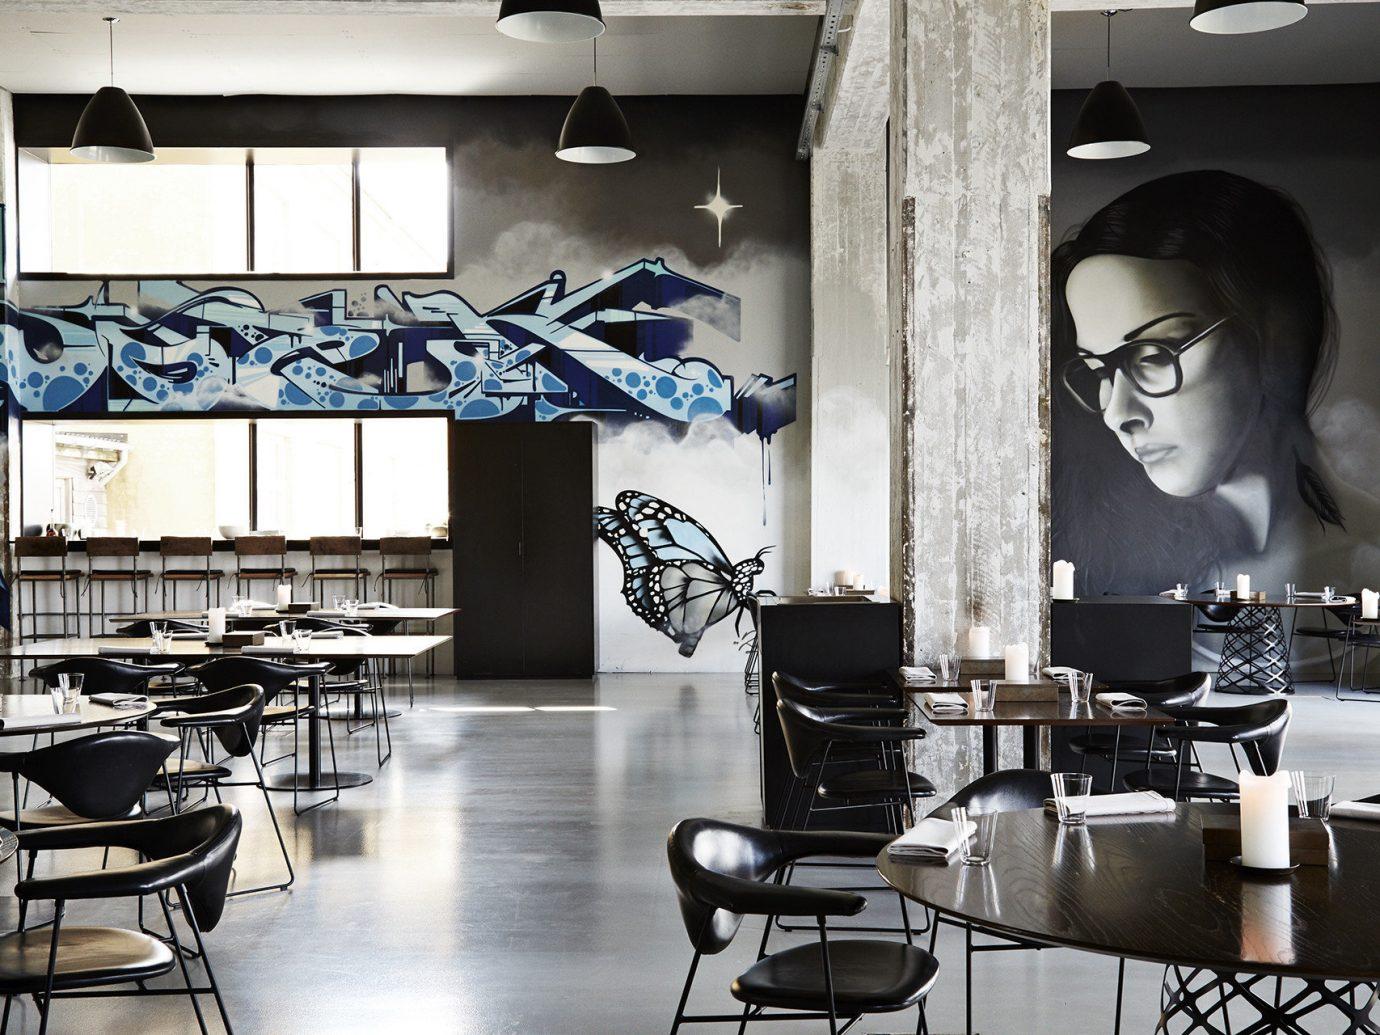 Copenhagen Denmark Trip Ideas interior design furniture table restaurant